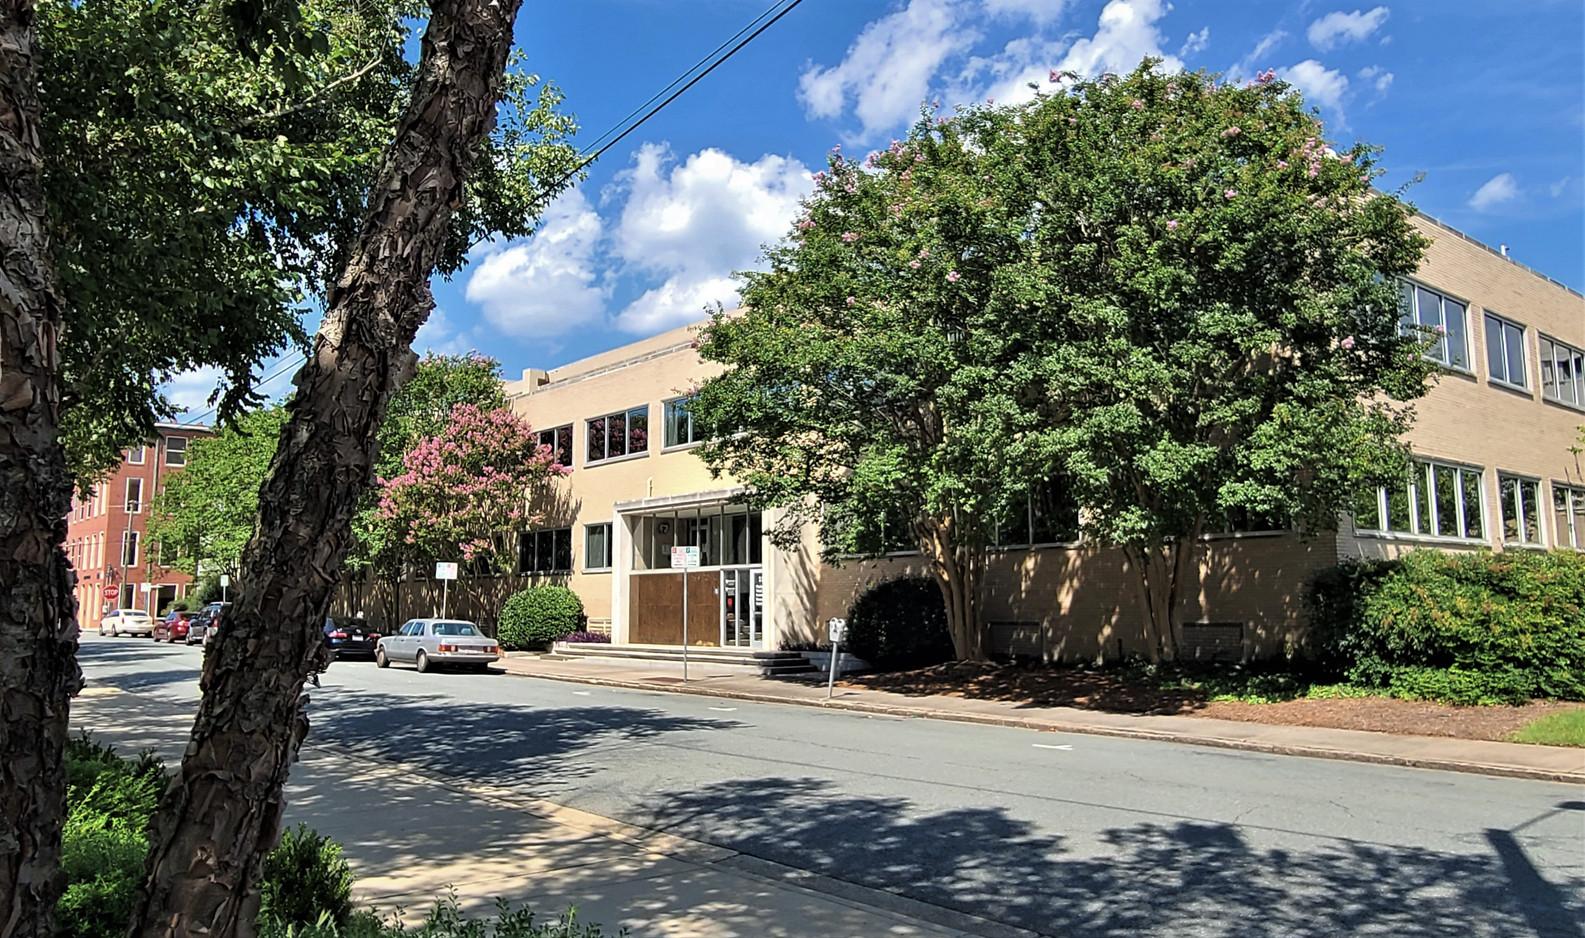 Piedmont Community Research Center